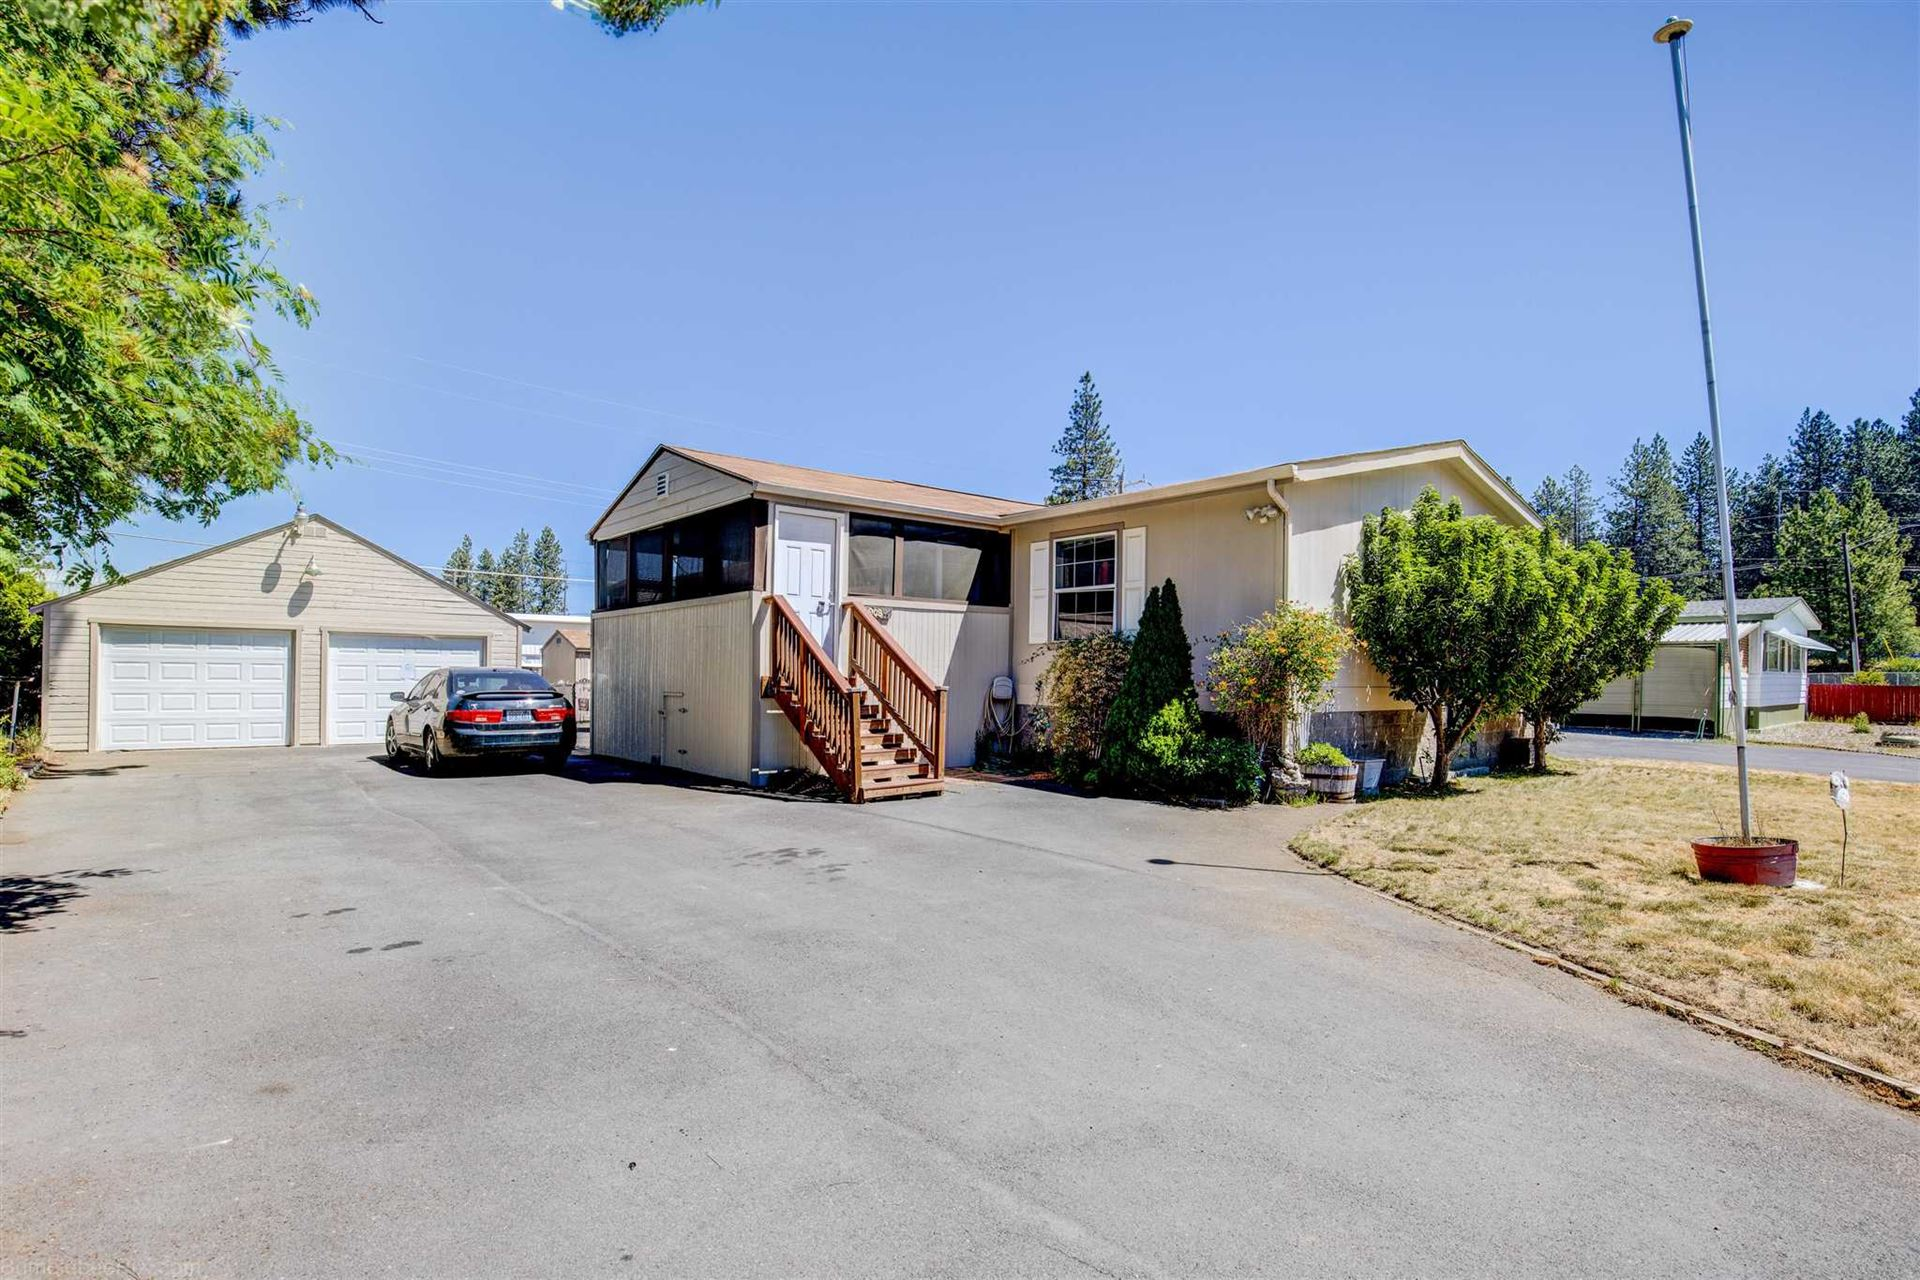 908 S Nina Cir, Spokane Valley, WA 99206 - #: 202116863